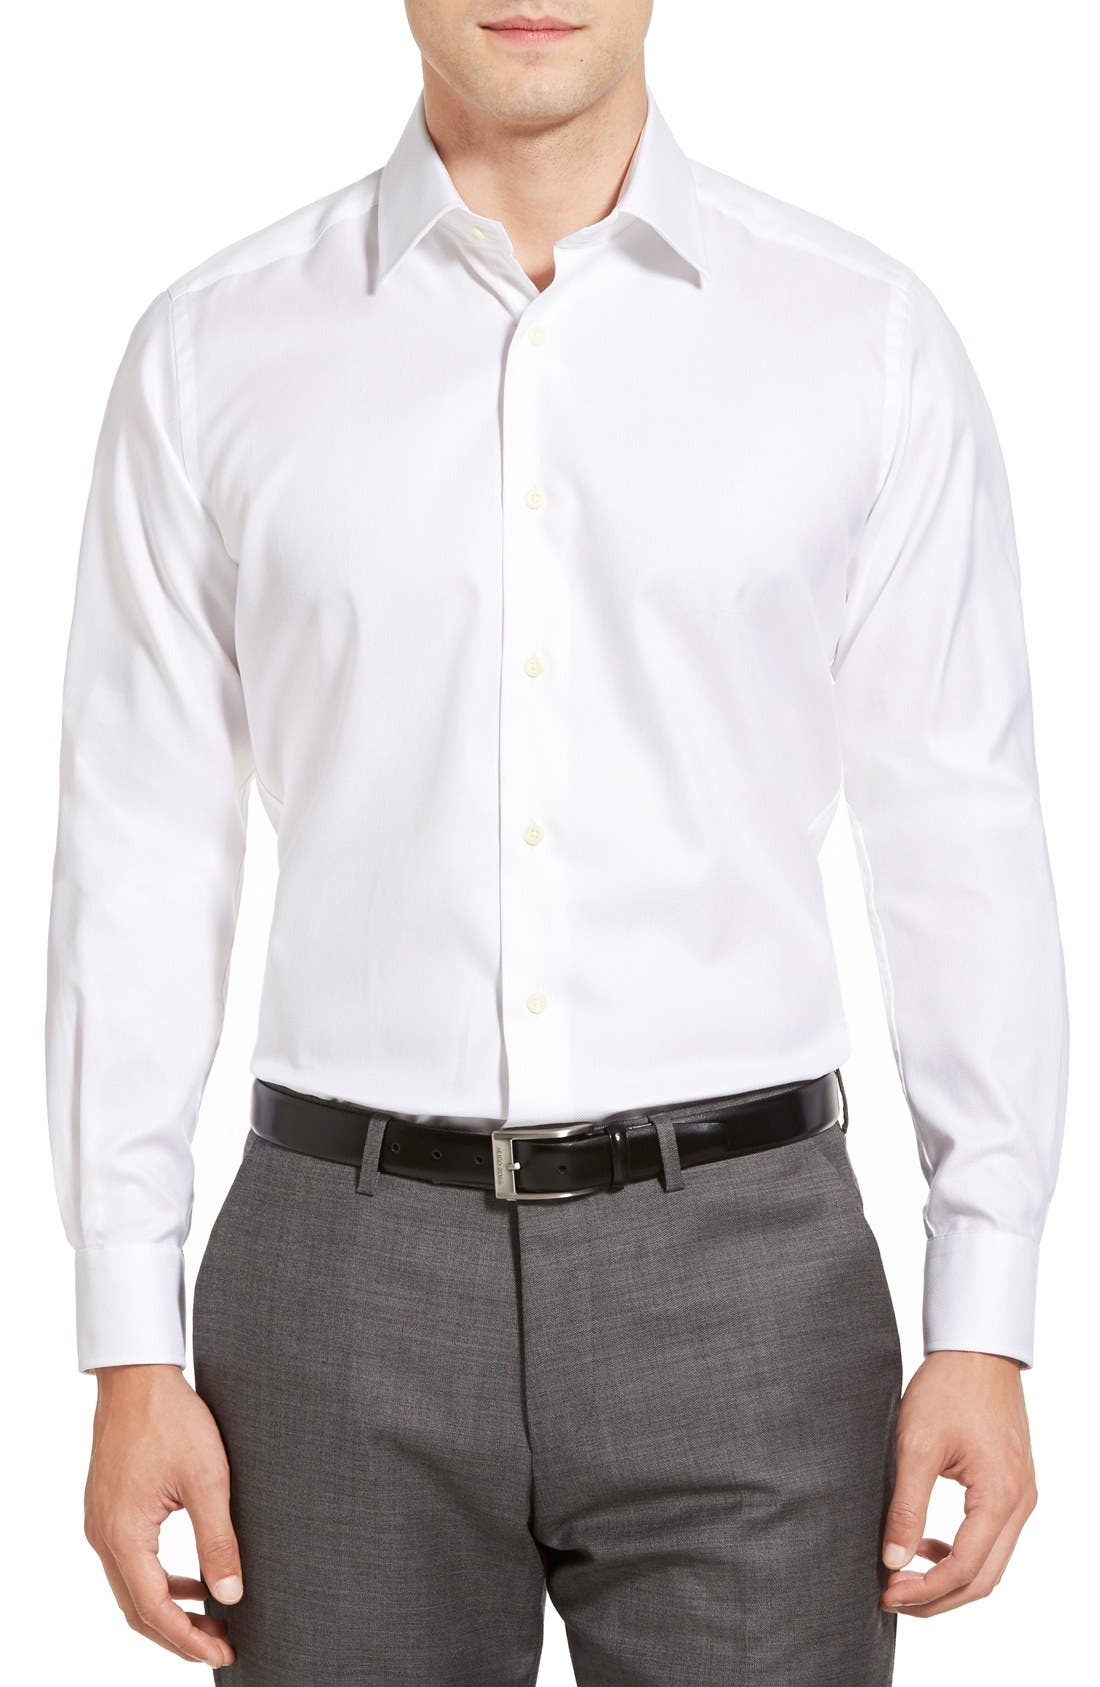 DAVID DONAHUE, Trim Fit Dress Shirt, Alternate thumbnail 5, color, WHITE